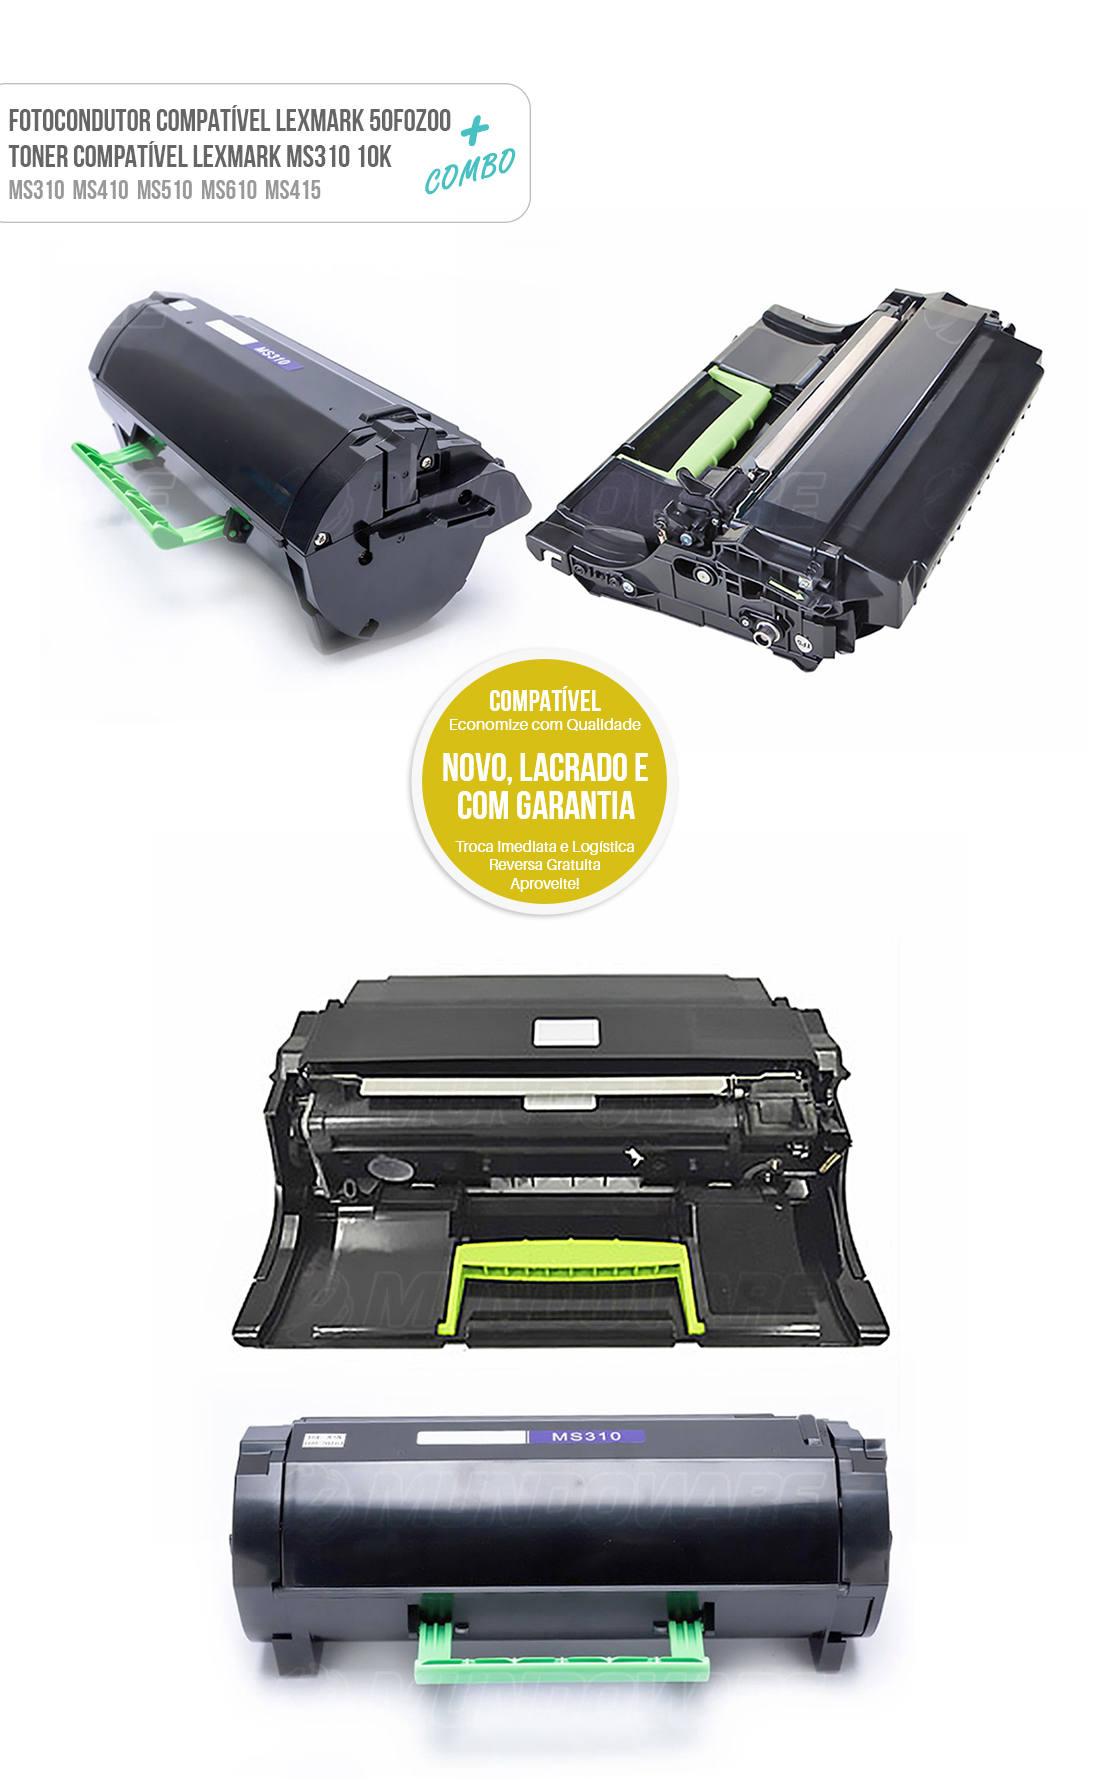 Cartucho de Cilindro + Toner Compatível para Lexmark MS310 MS310D MS310DN MS312 MS312DN MS315 MS315DN MS410 MS410DN MS410D MS415 MS415DN MS510 MS510DN MS610 MS610DN MS610DE MS610DTE Tonner